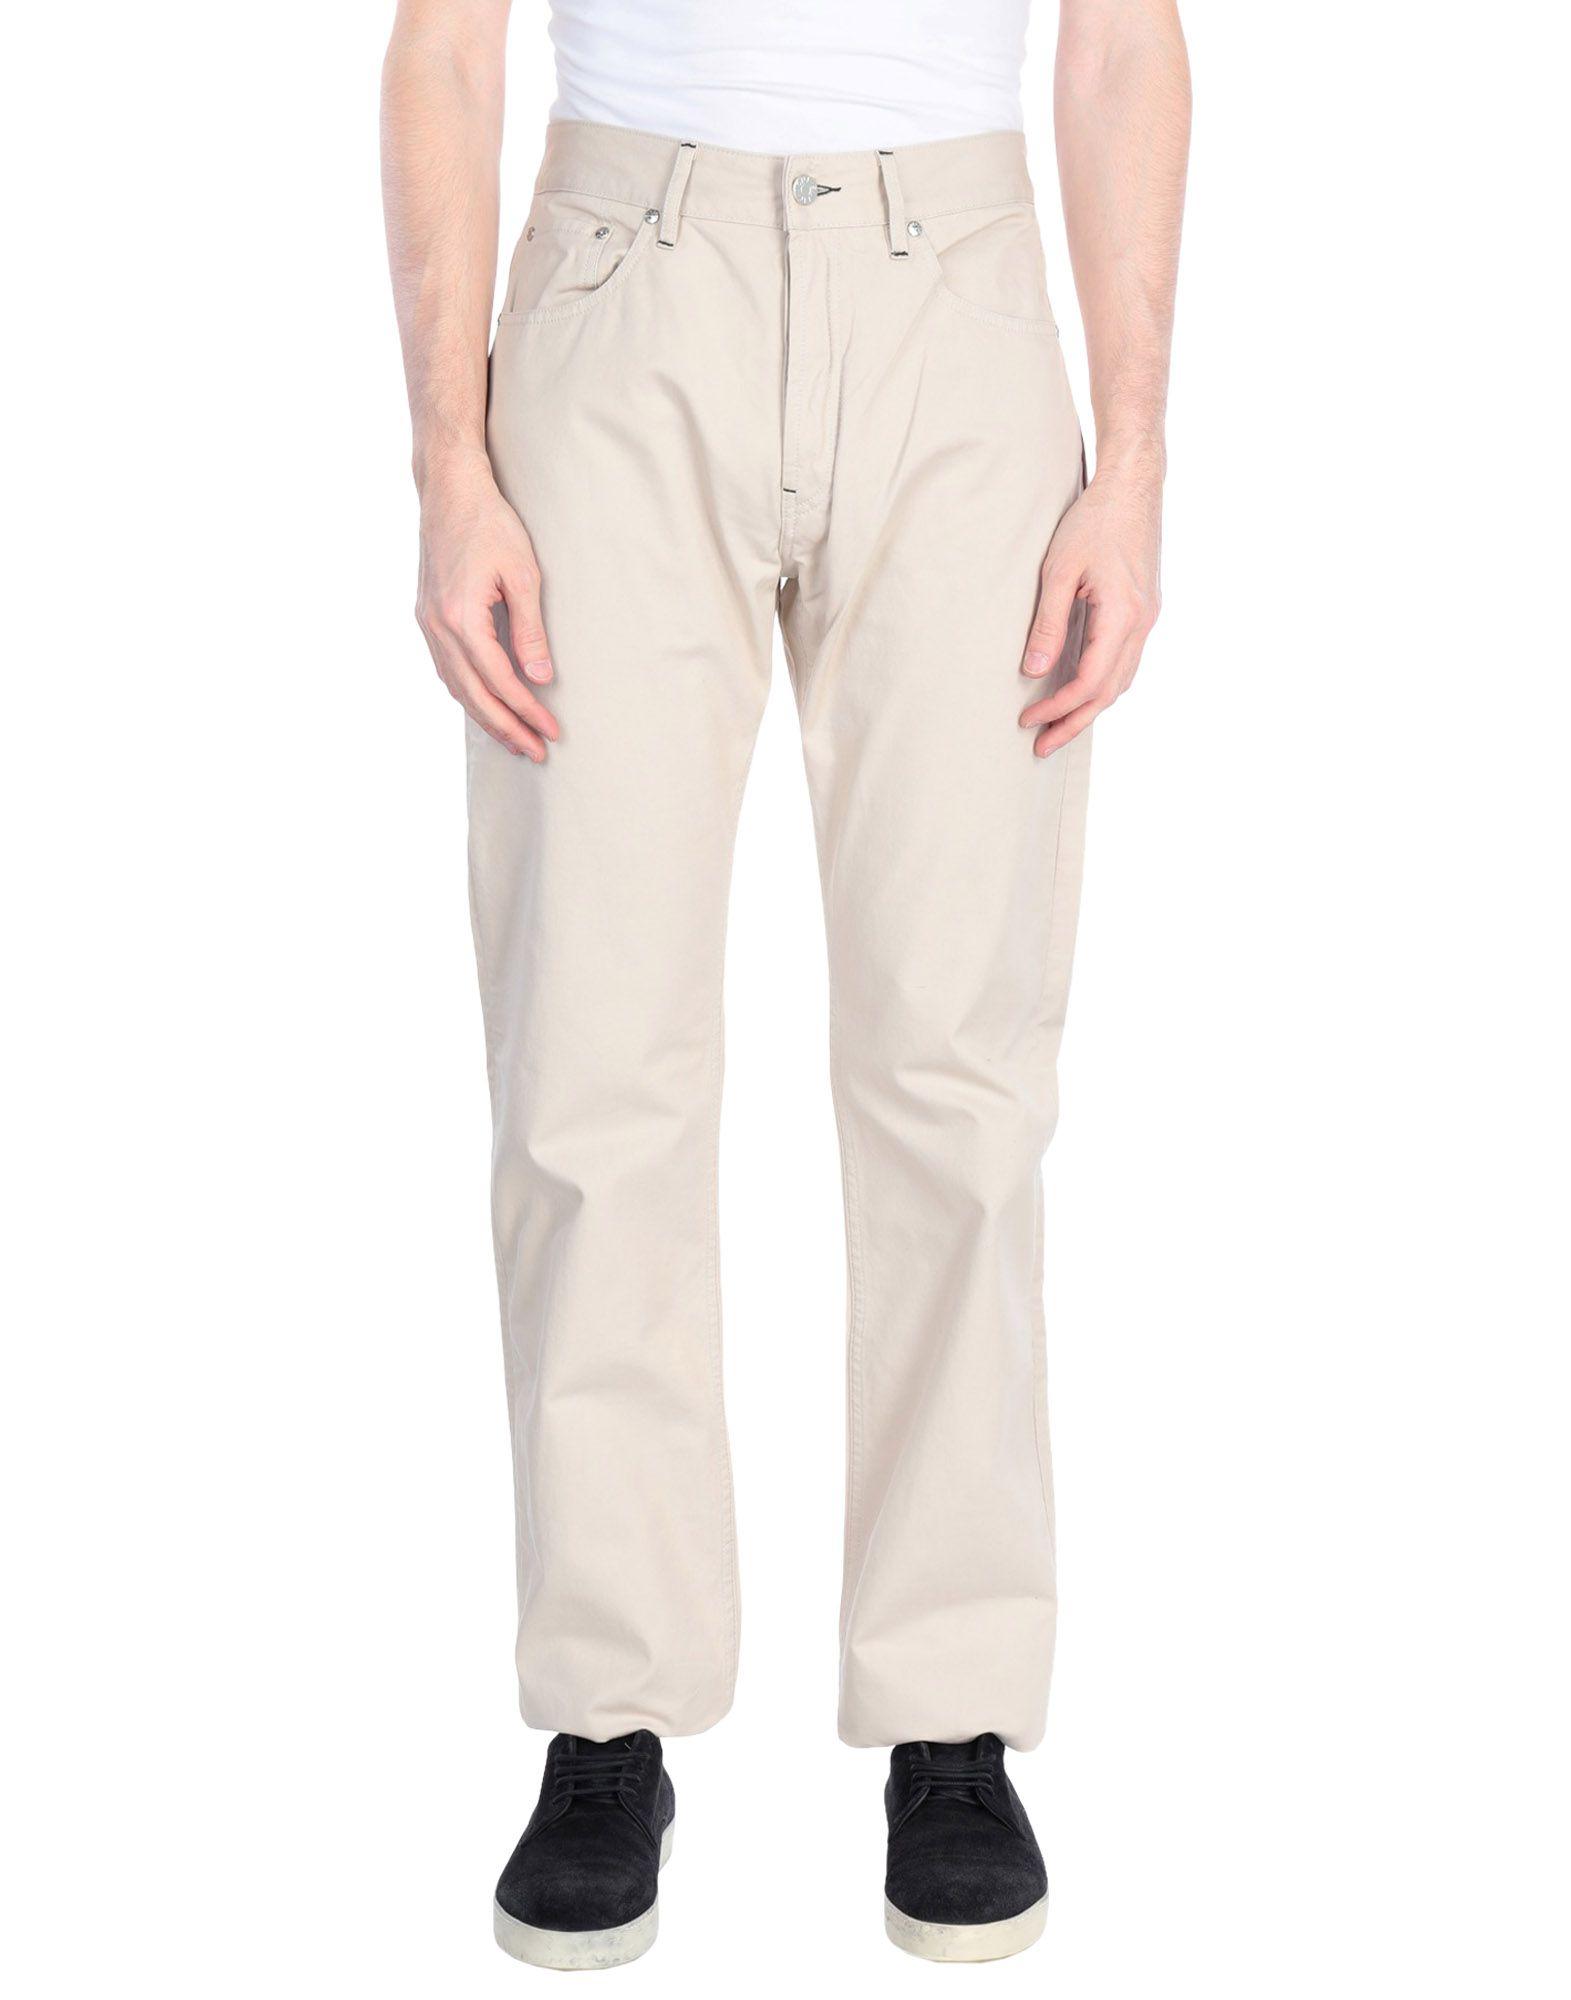 92f79f2da Buy acne studios pants for men - Best men's acne studios pants shop ...